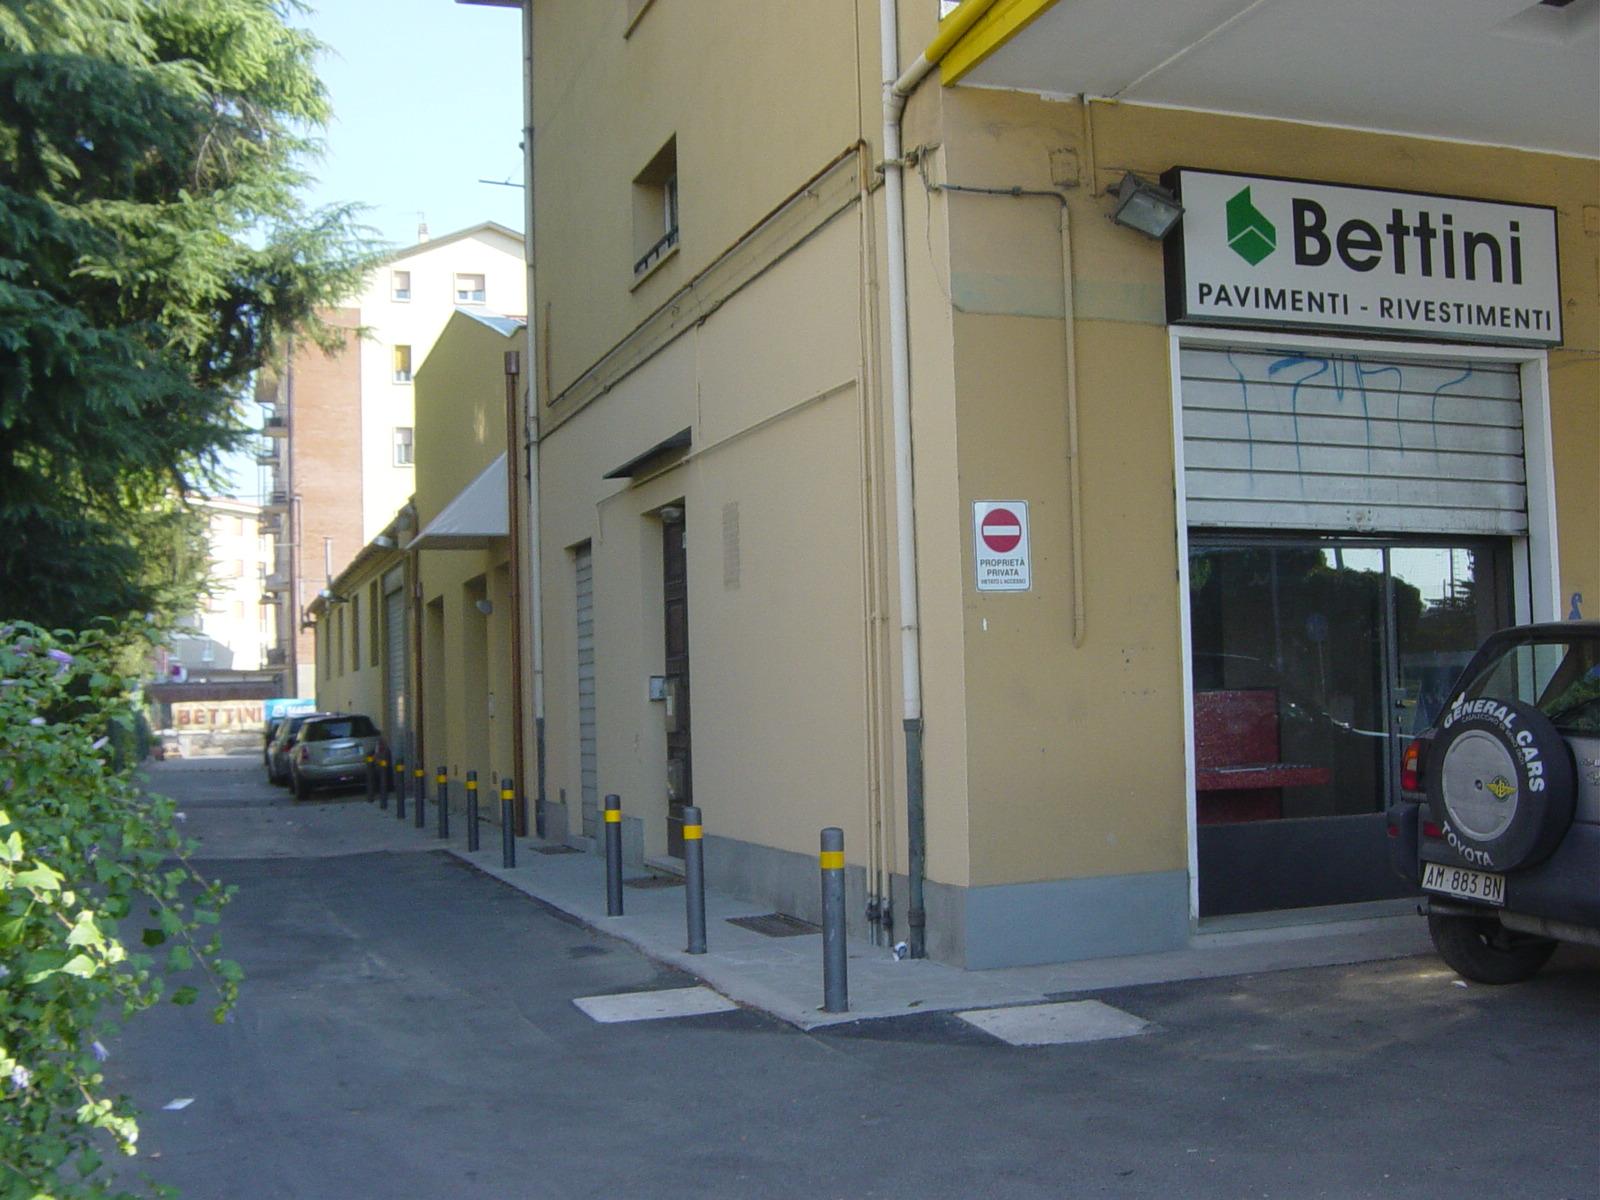 Imprese Edili Bolzano, Imprese Edili Bologna E Provincia, Imprese Edili Bologna, Imprese Edili ...